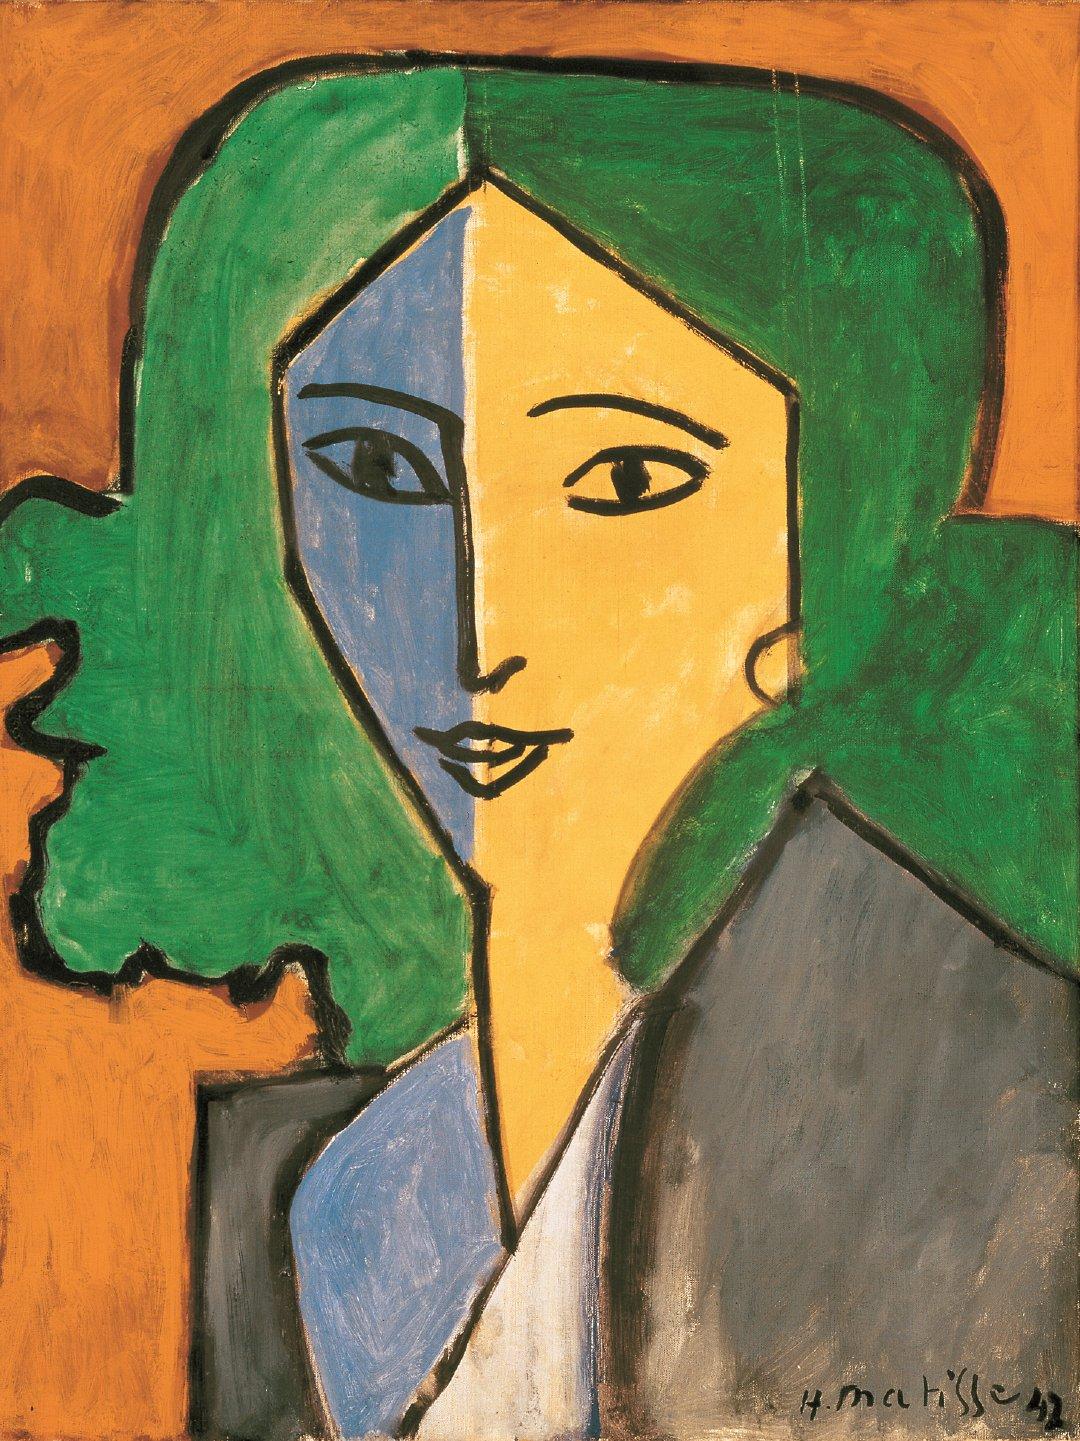 亨利·马蒂斯(Henri Matisse,1869—1954)